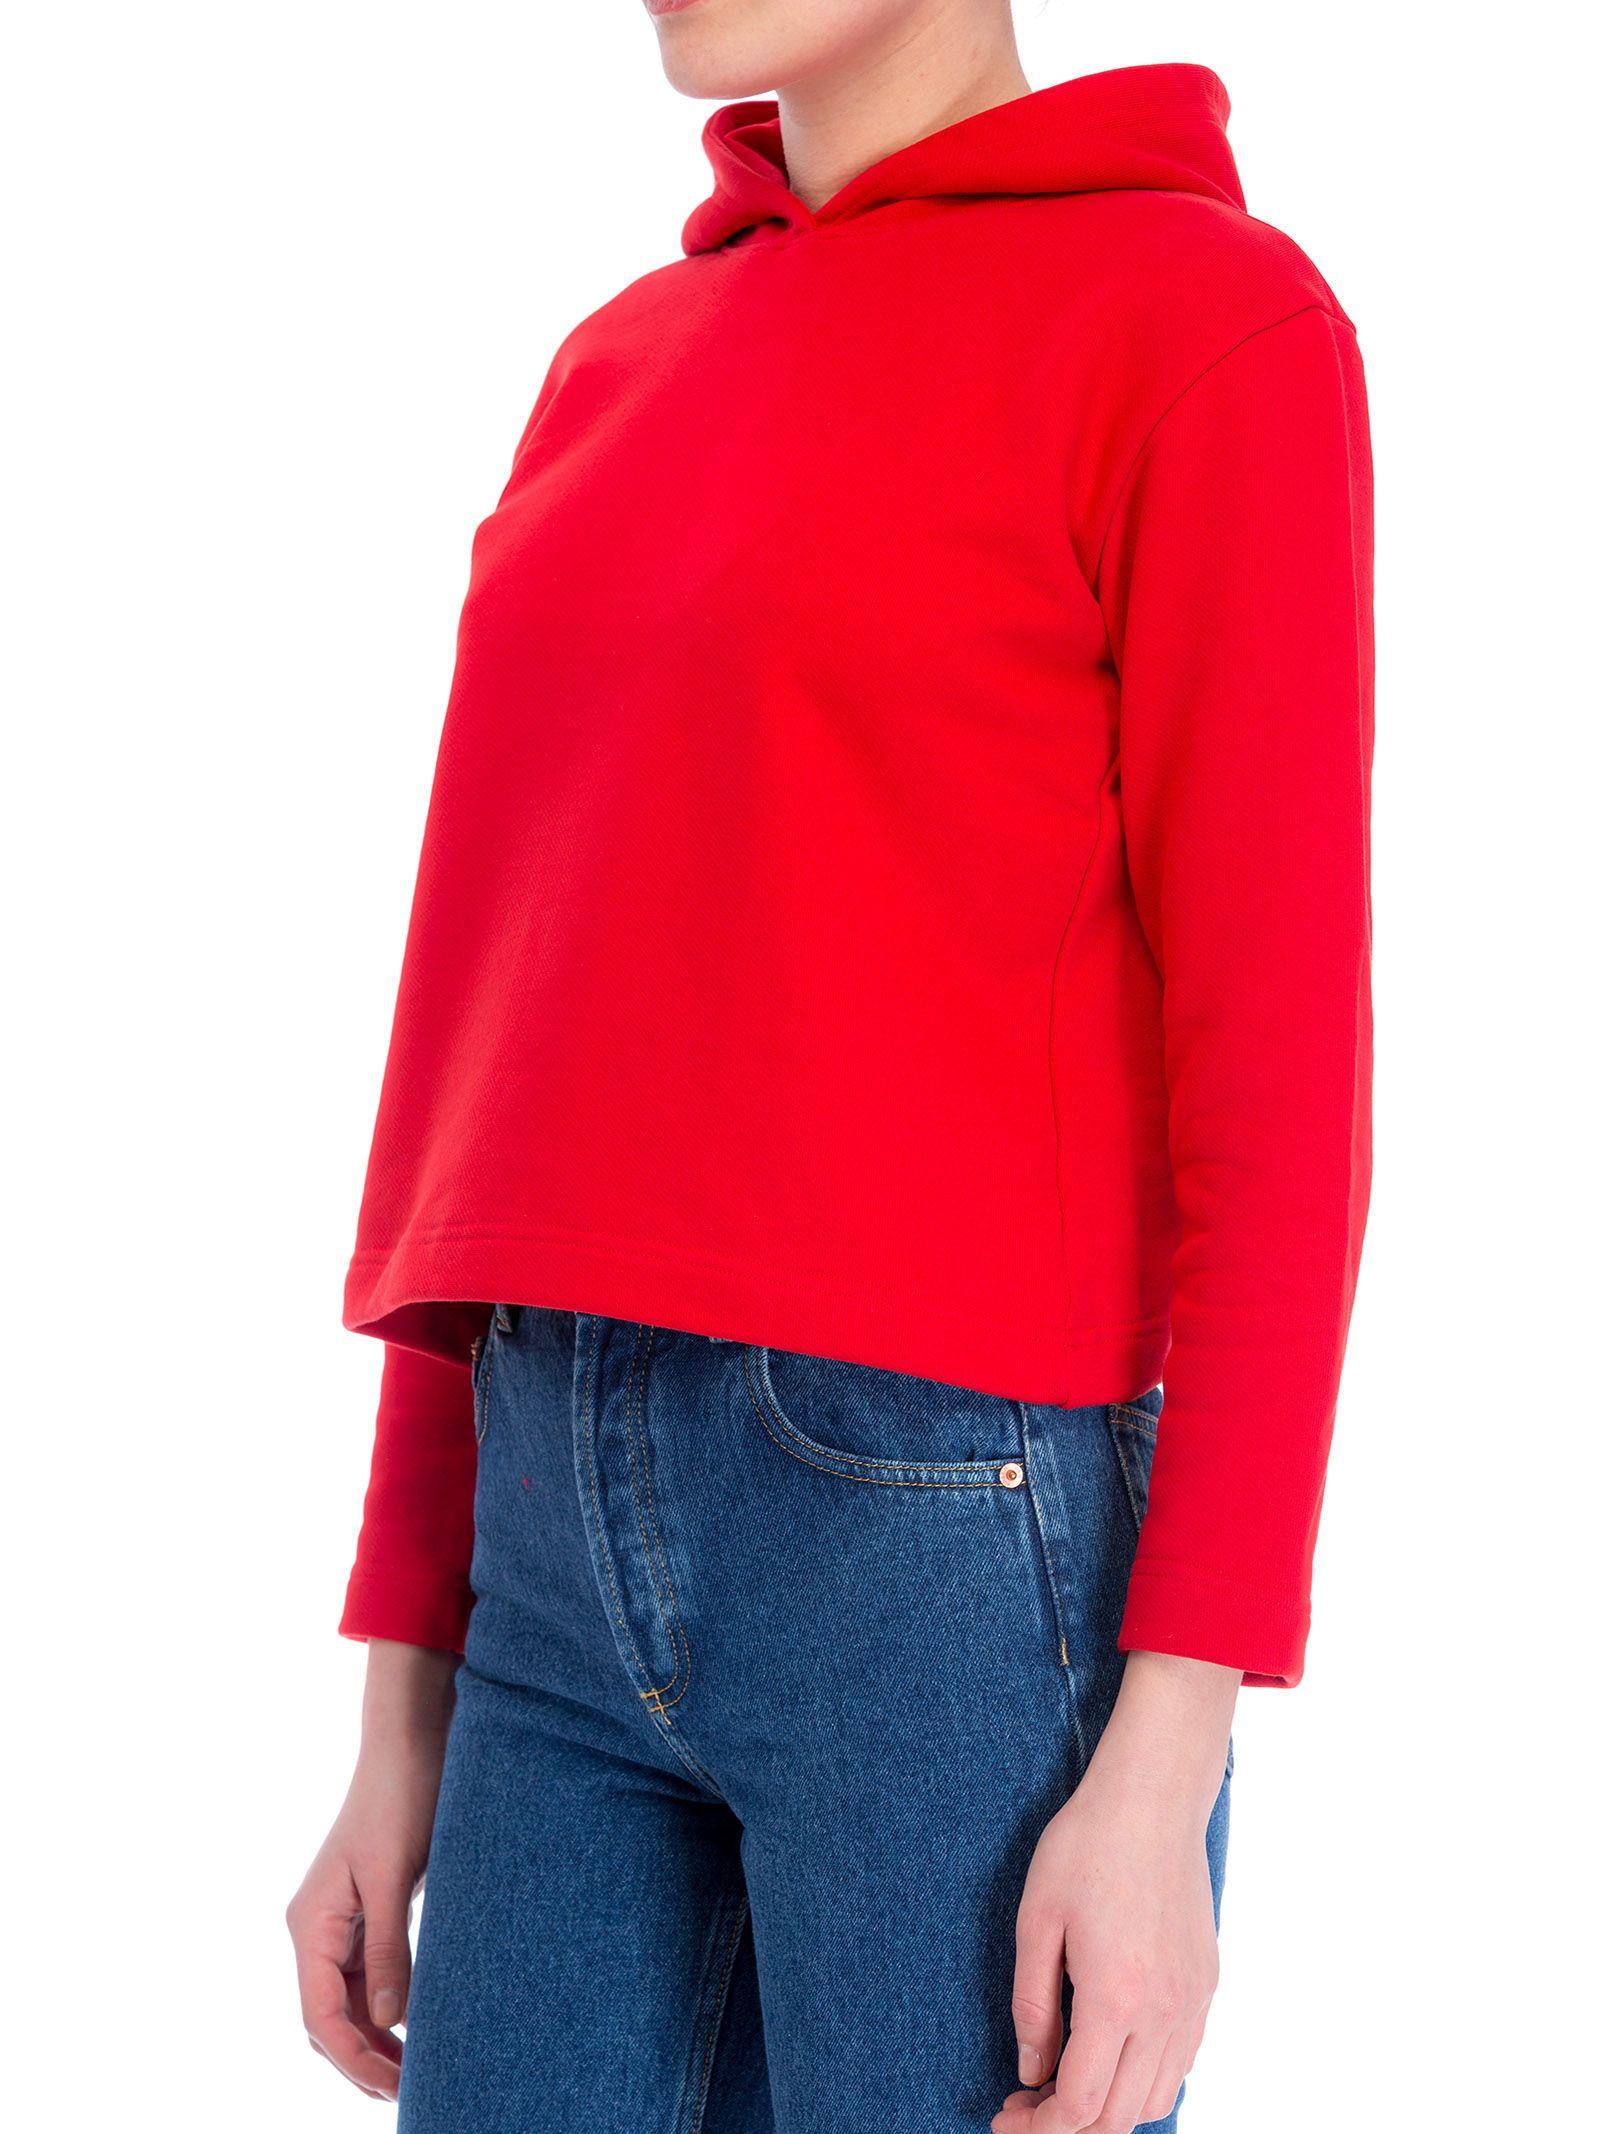 balenciaga hoodie womens red